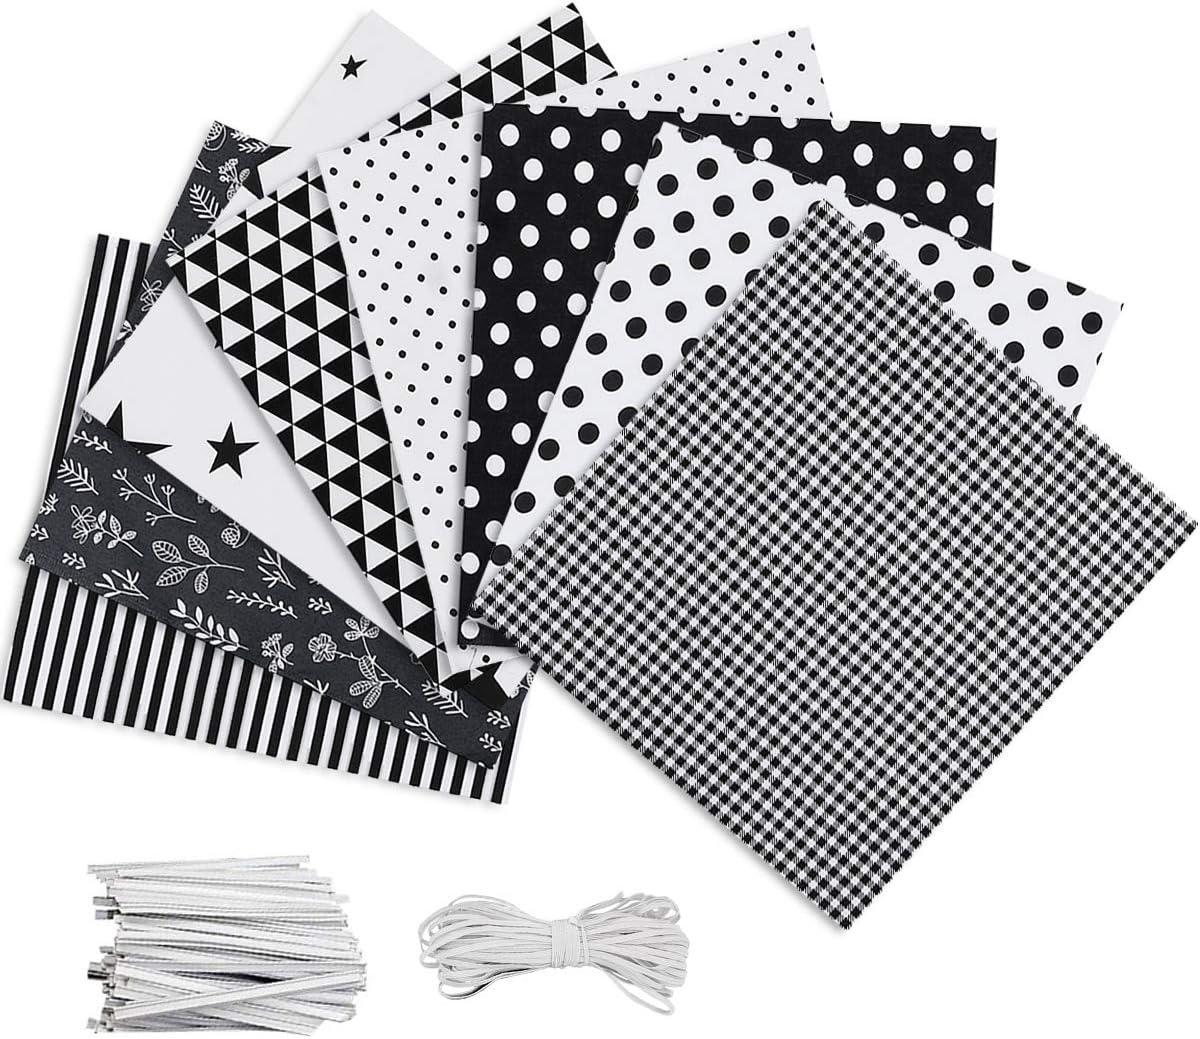 Jeteven 8pcs DIY Cotton Fabric Patchwork Squares  with Pattern WAS £10.99 NOW £6 w/code JetevenX5 @ Amazon